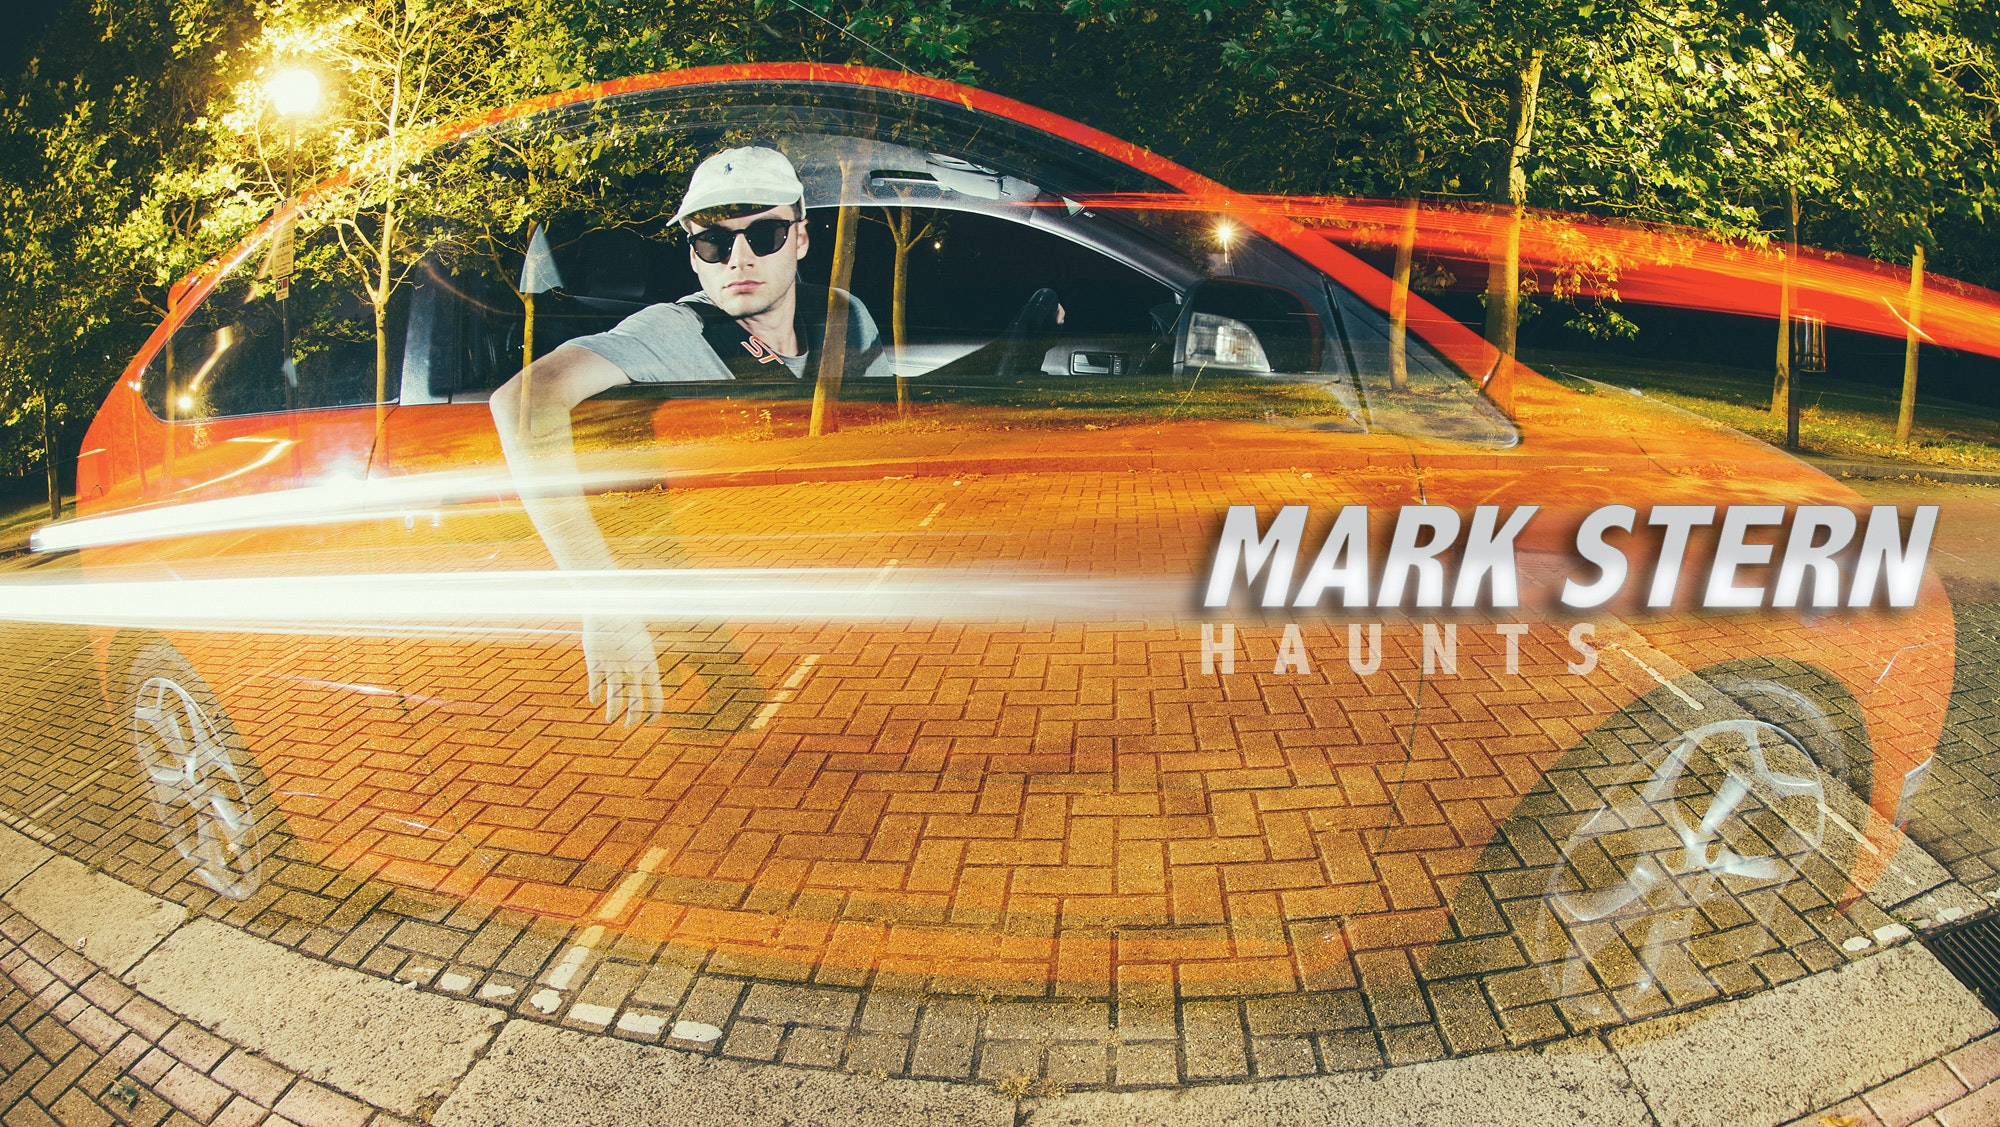 Mark Stern – Haunts